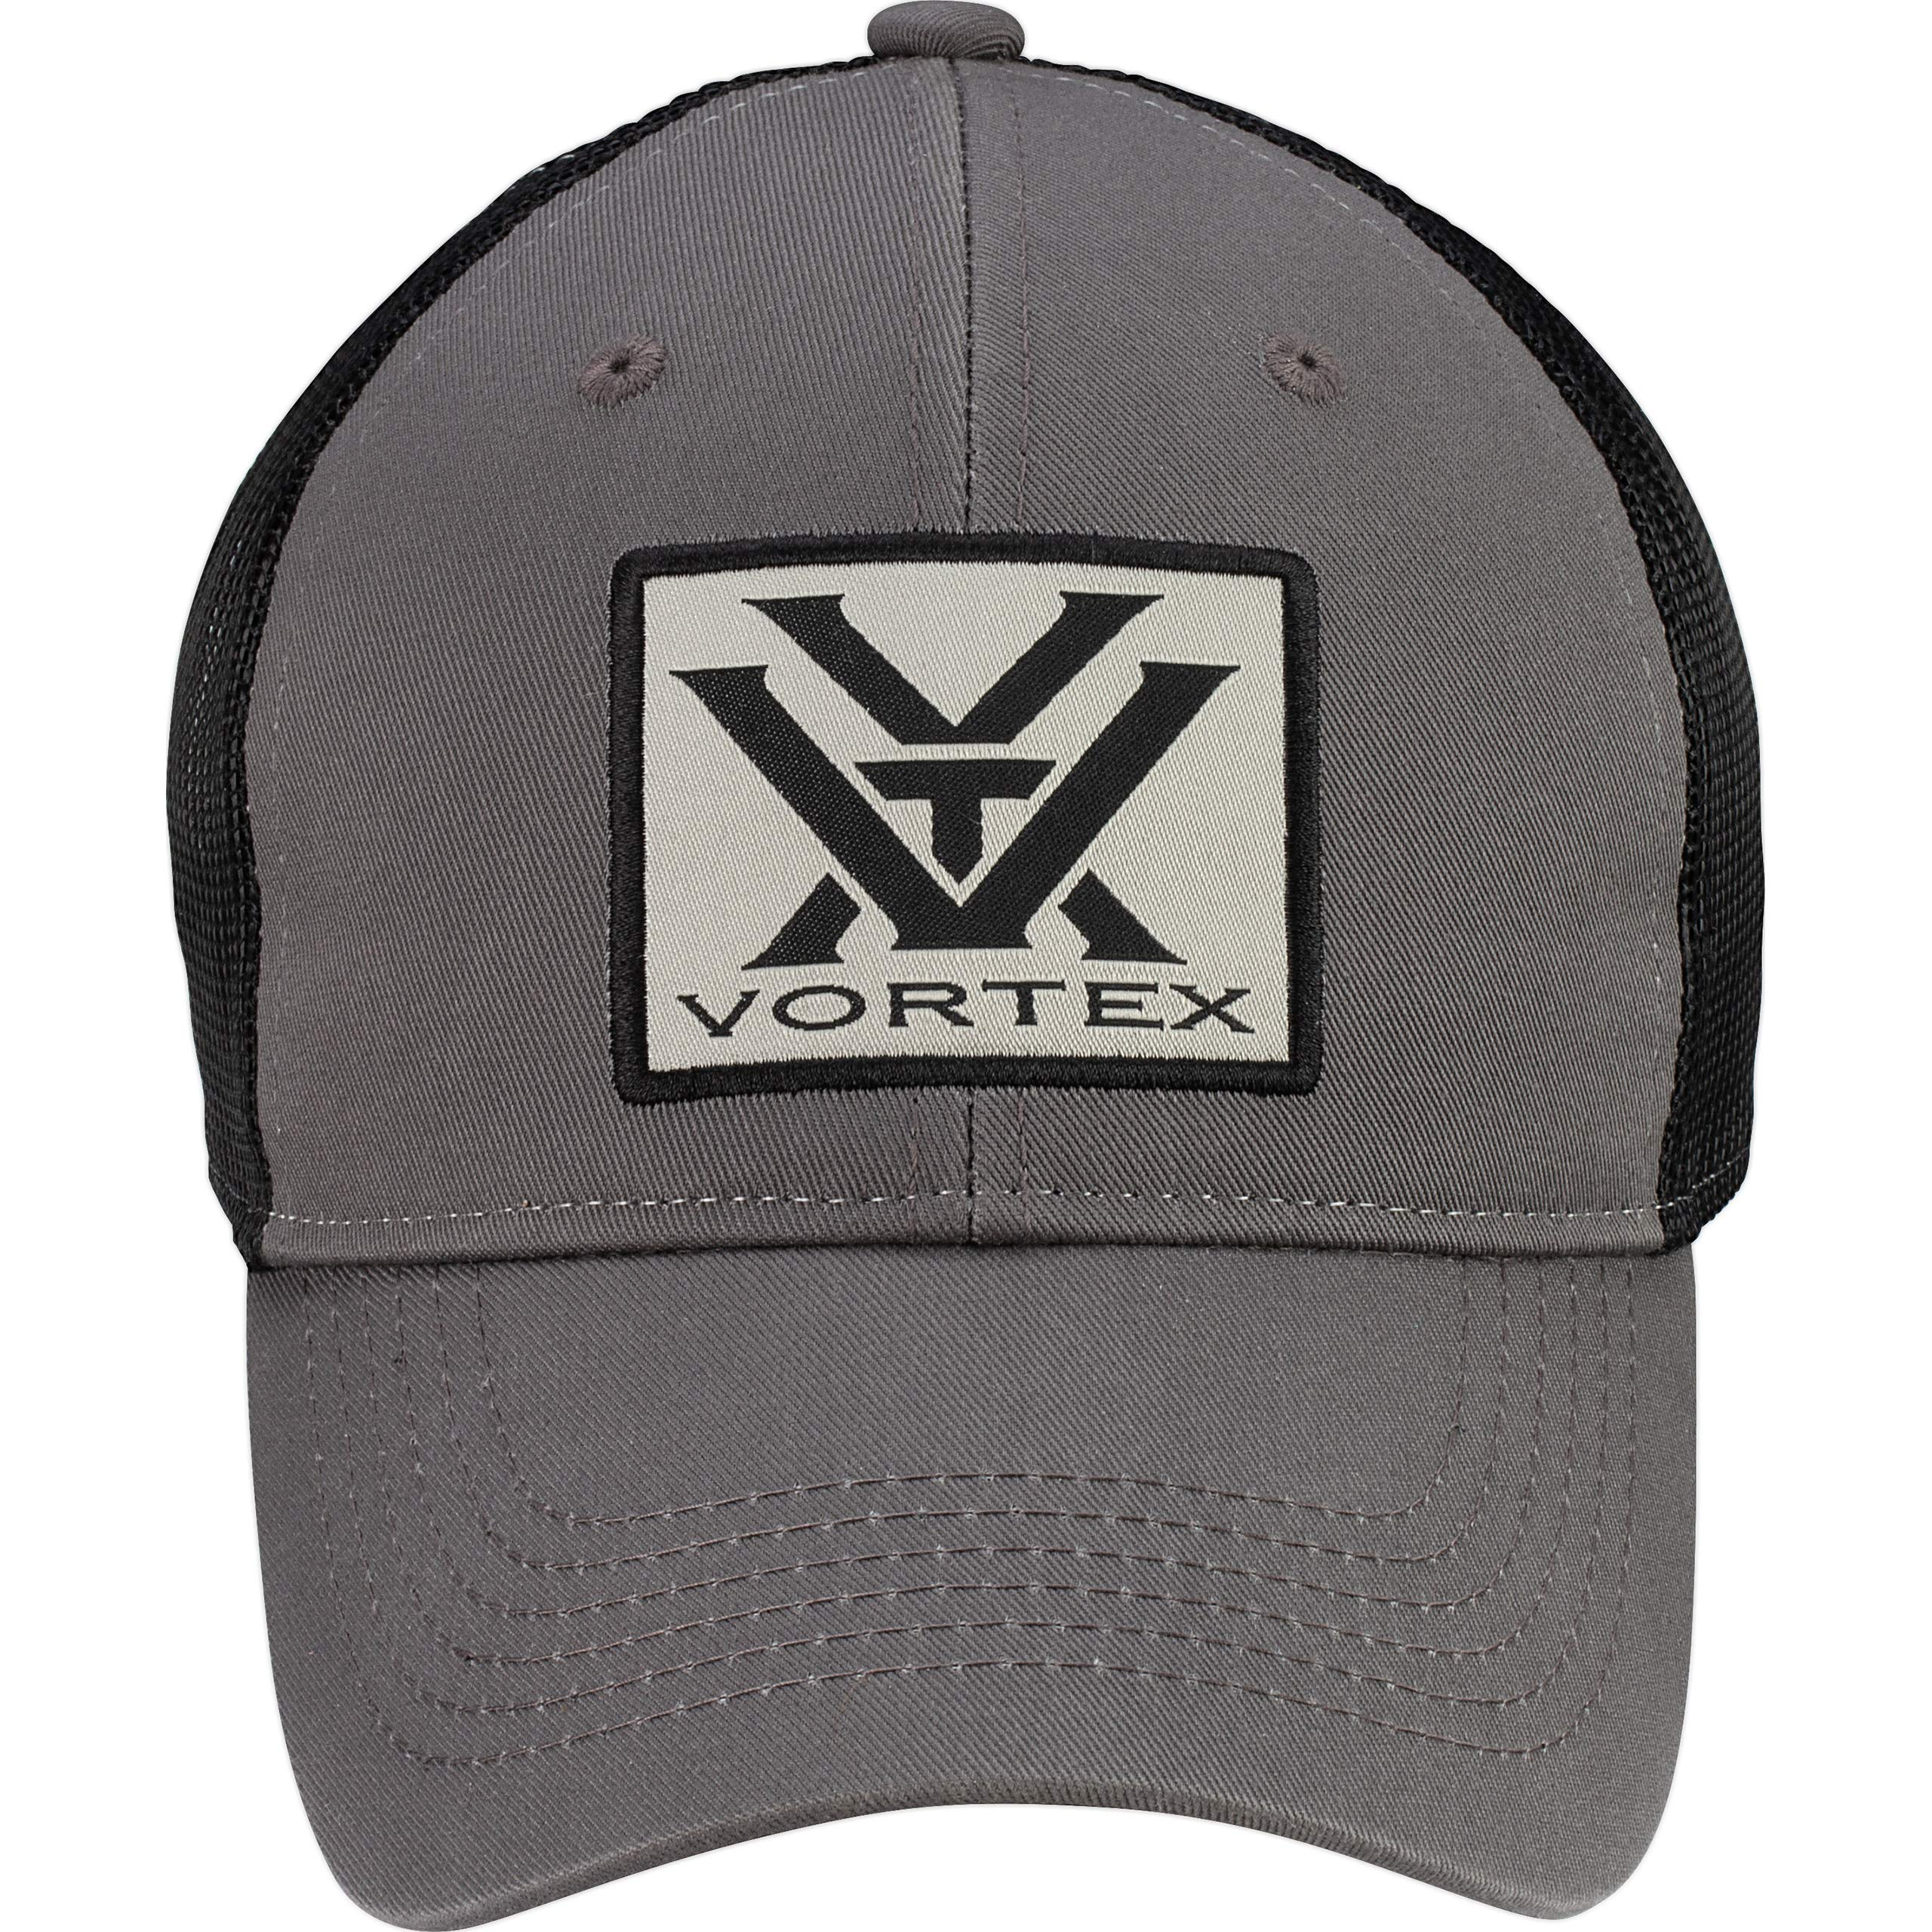 Vortex Optics Barneveld 608 Hats